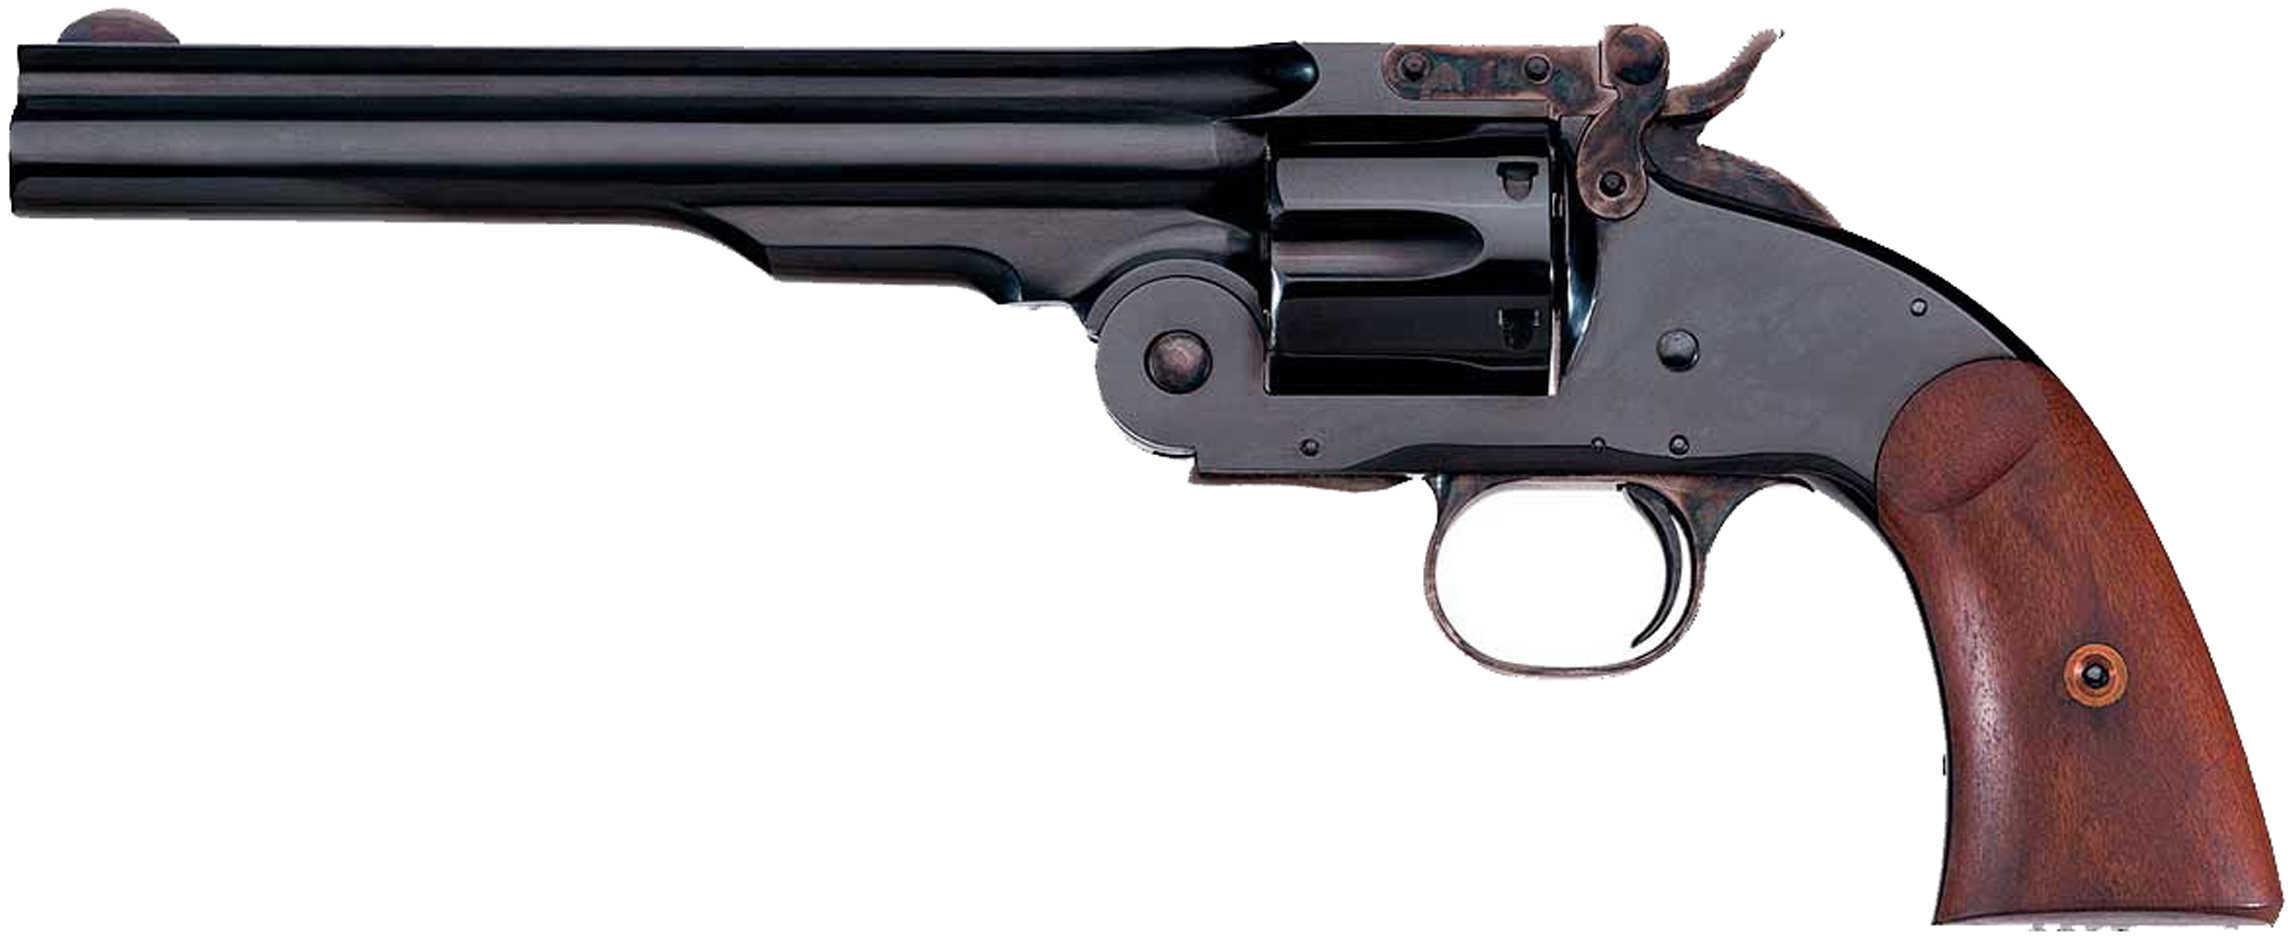 "Taylor's & Company Second Model Schofield 38 Special 7"" Barrel 6 Round Revolver"